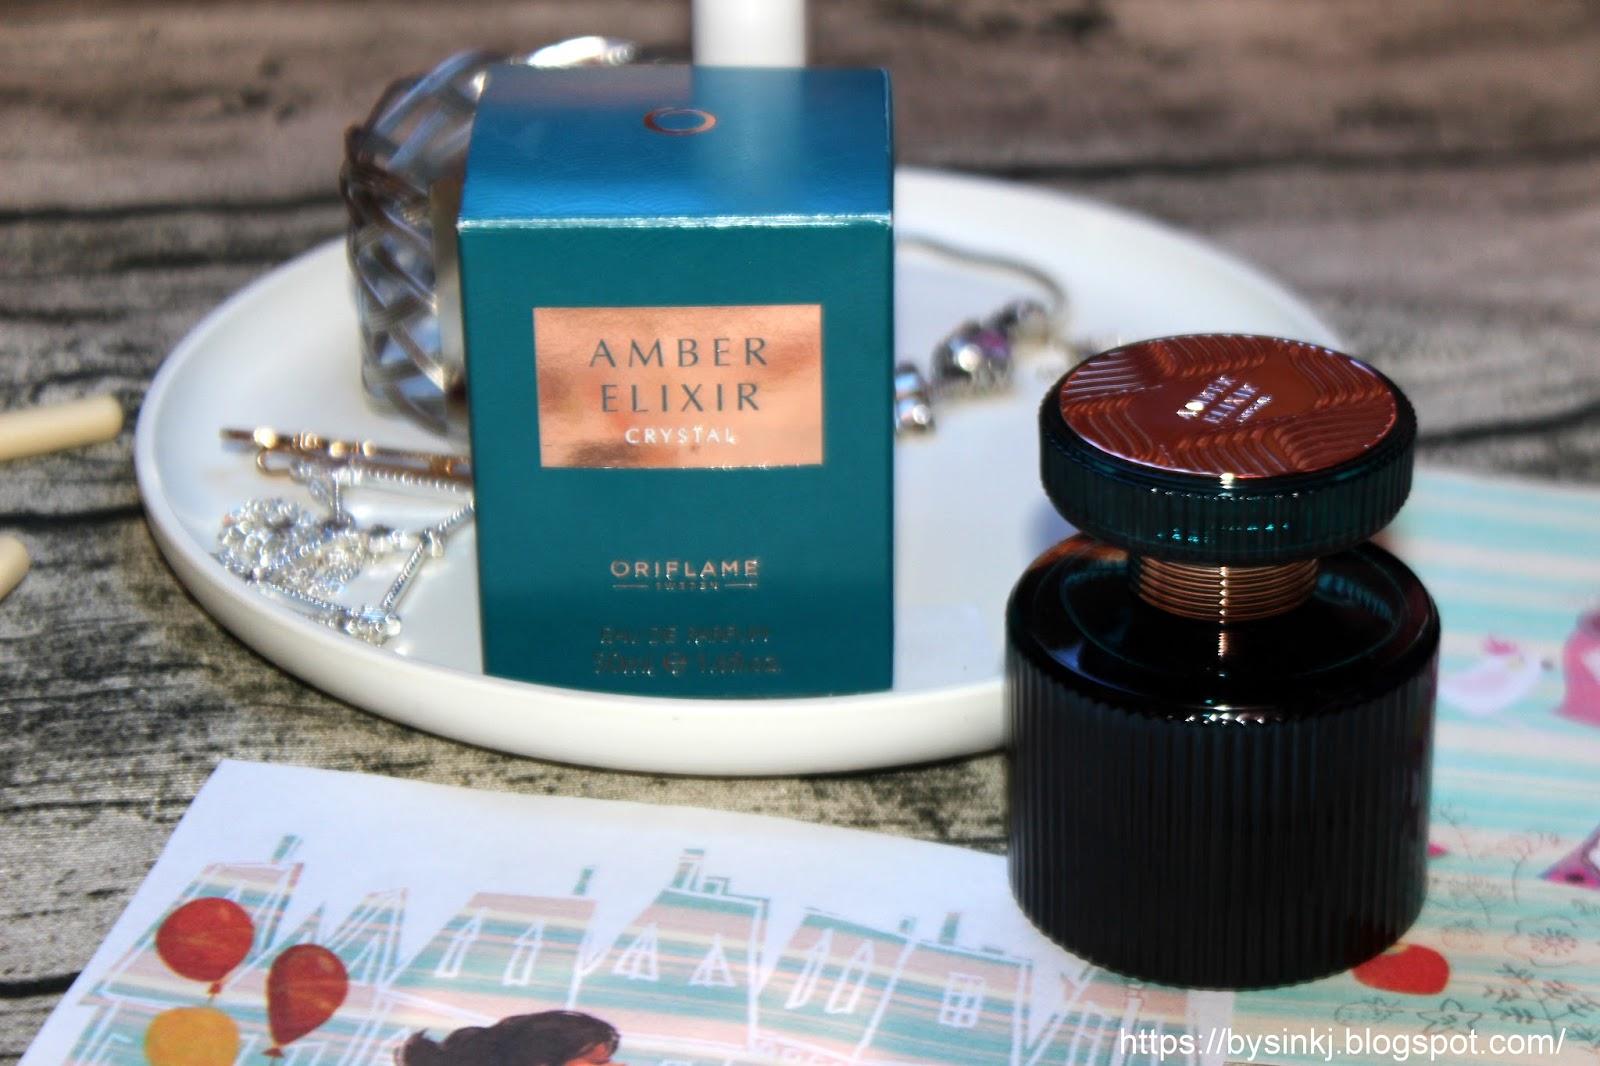 Oriflame Amber Elixir Crystal отзыв